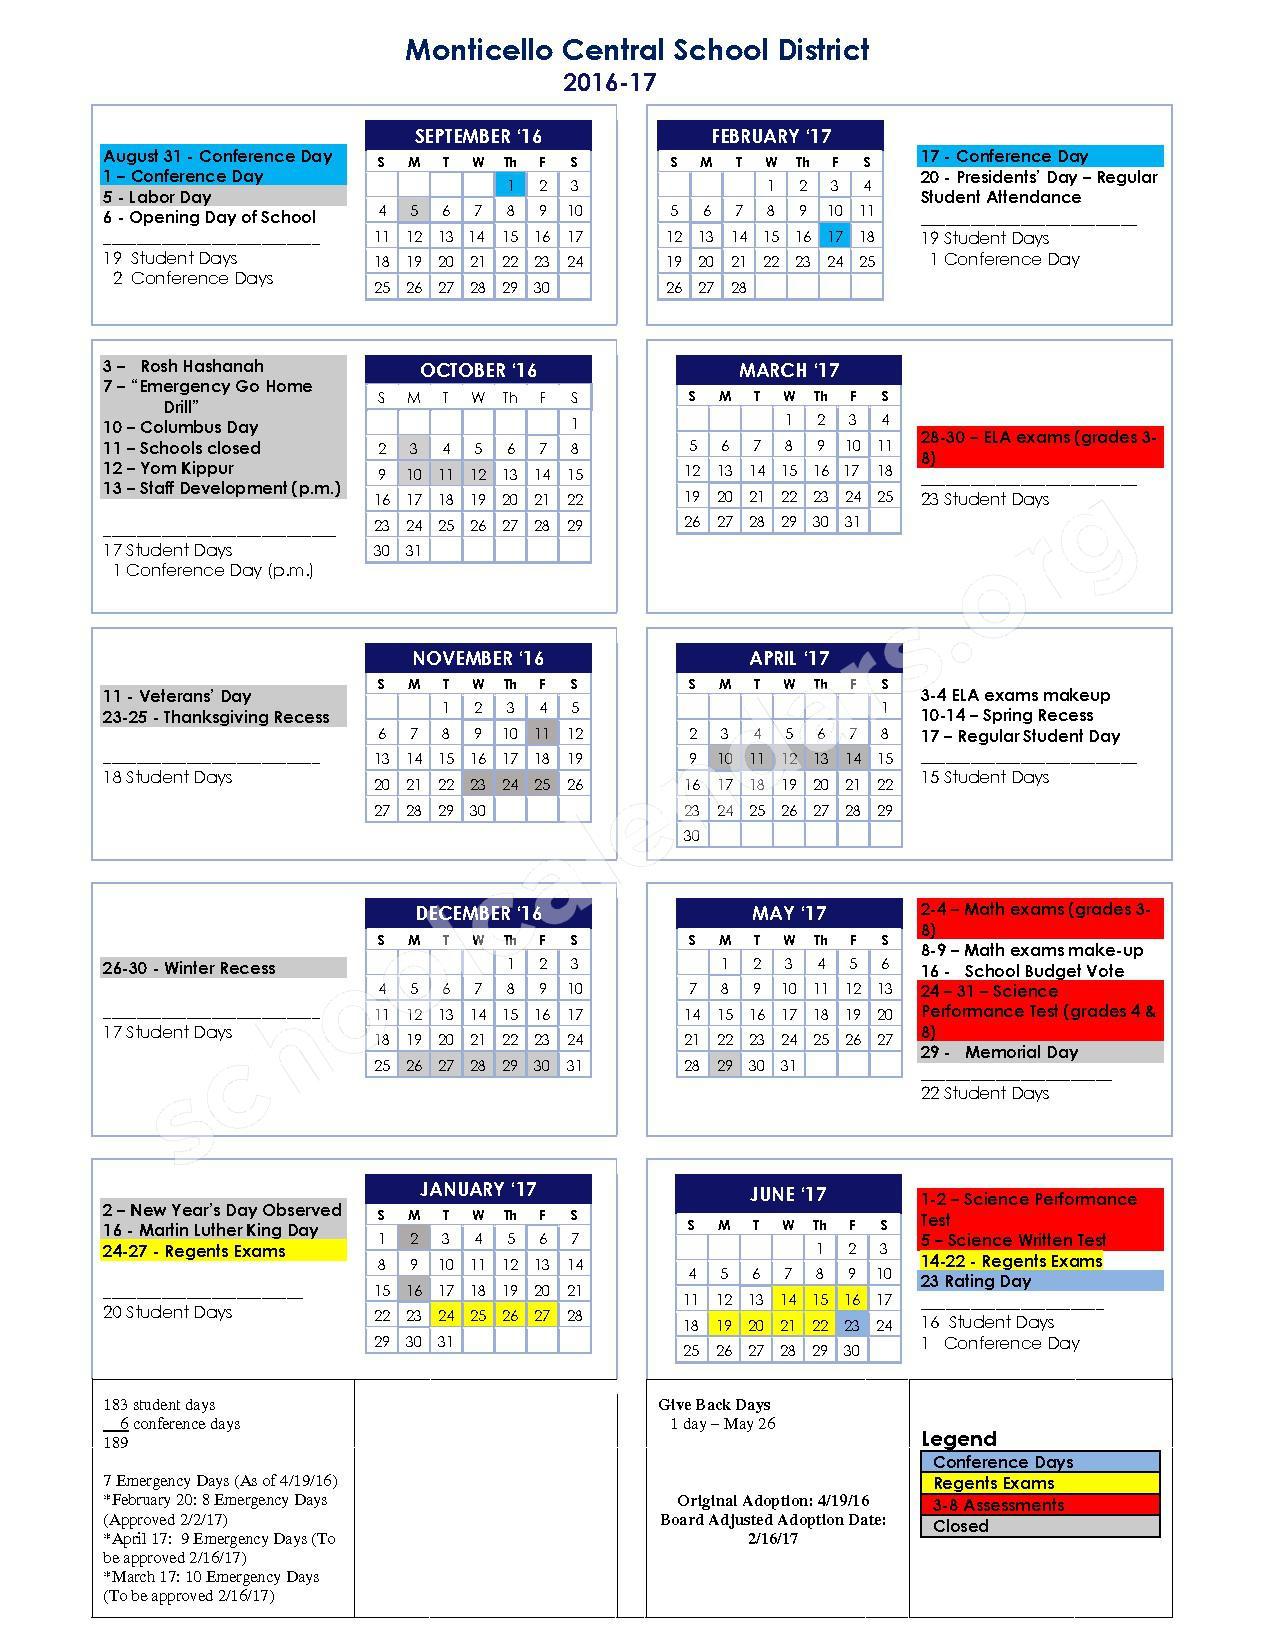 2017-2018 Monticello Central School Calendar – Monticello Central School District – page 1